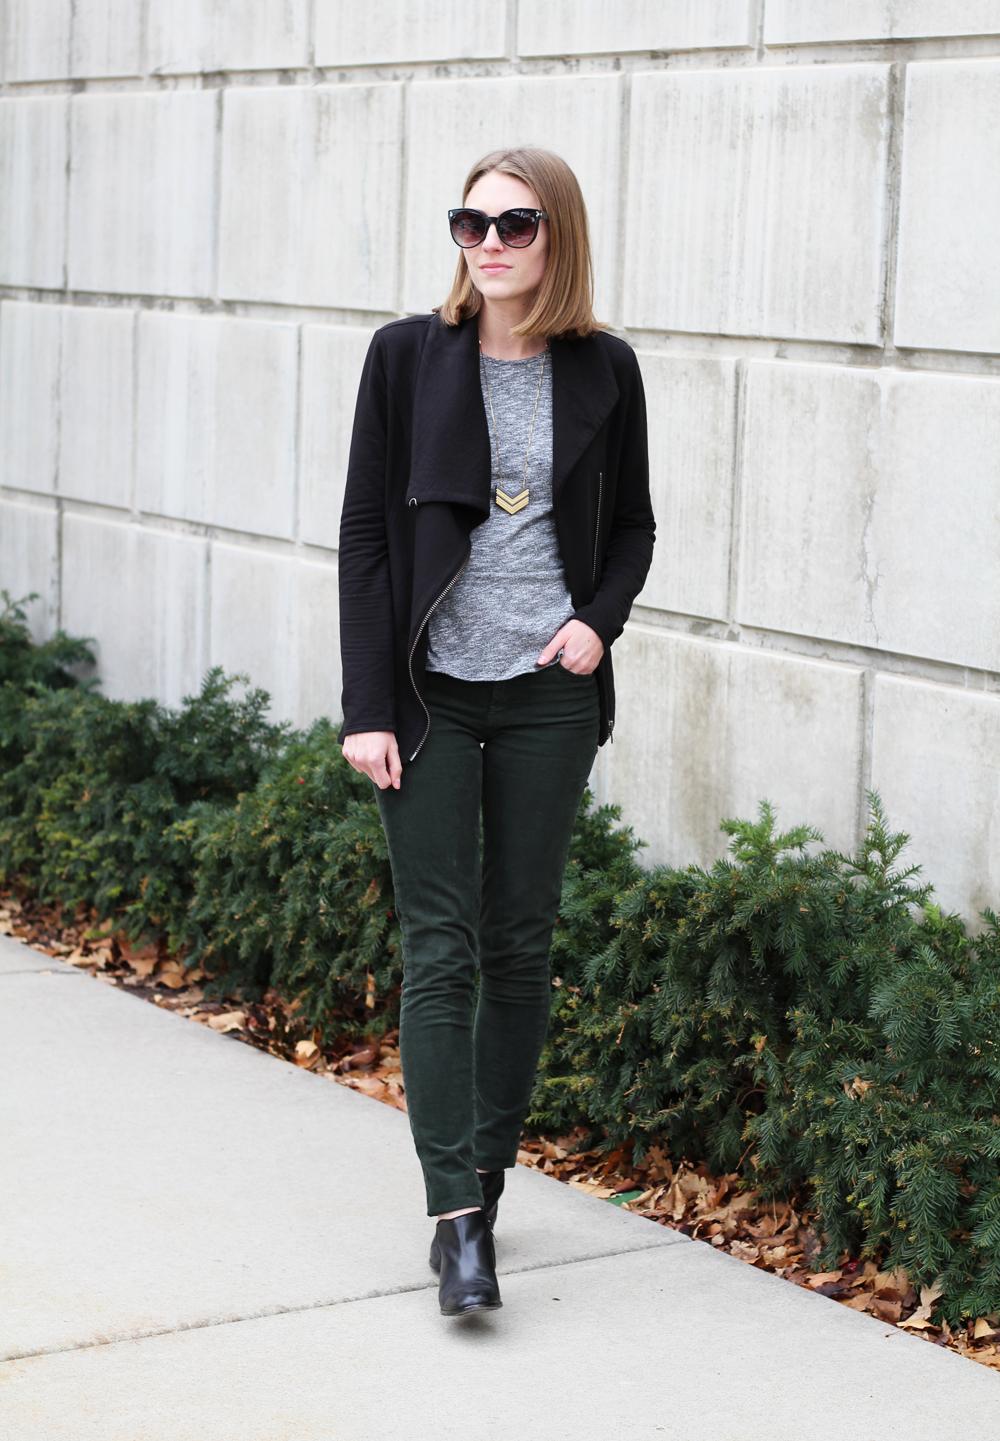 Helmut Lang sweatshirt, grey peplum top, green corduroy pants, black ankle boots — Cotton Cashmere Cat Hair